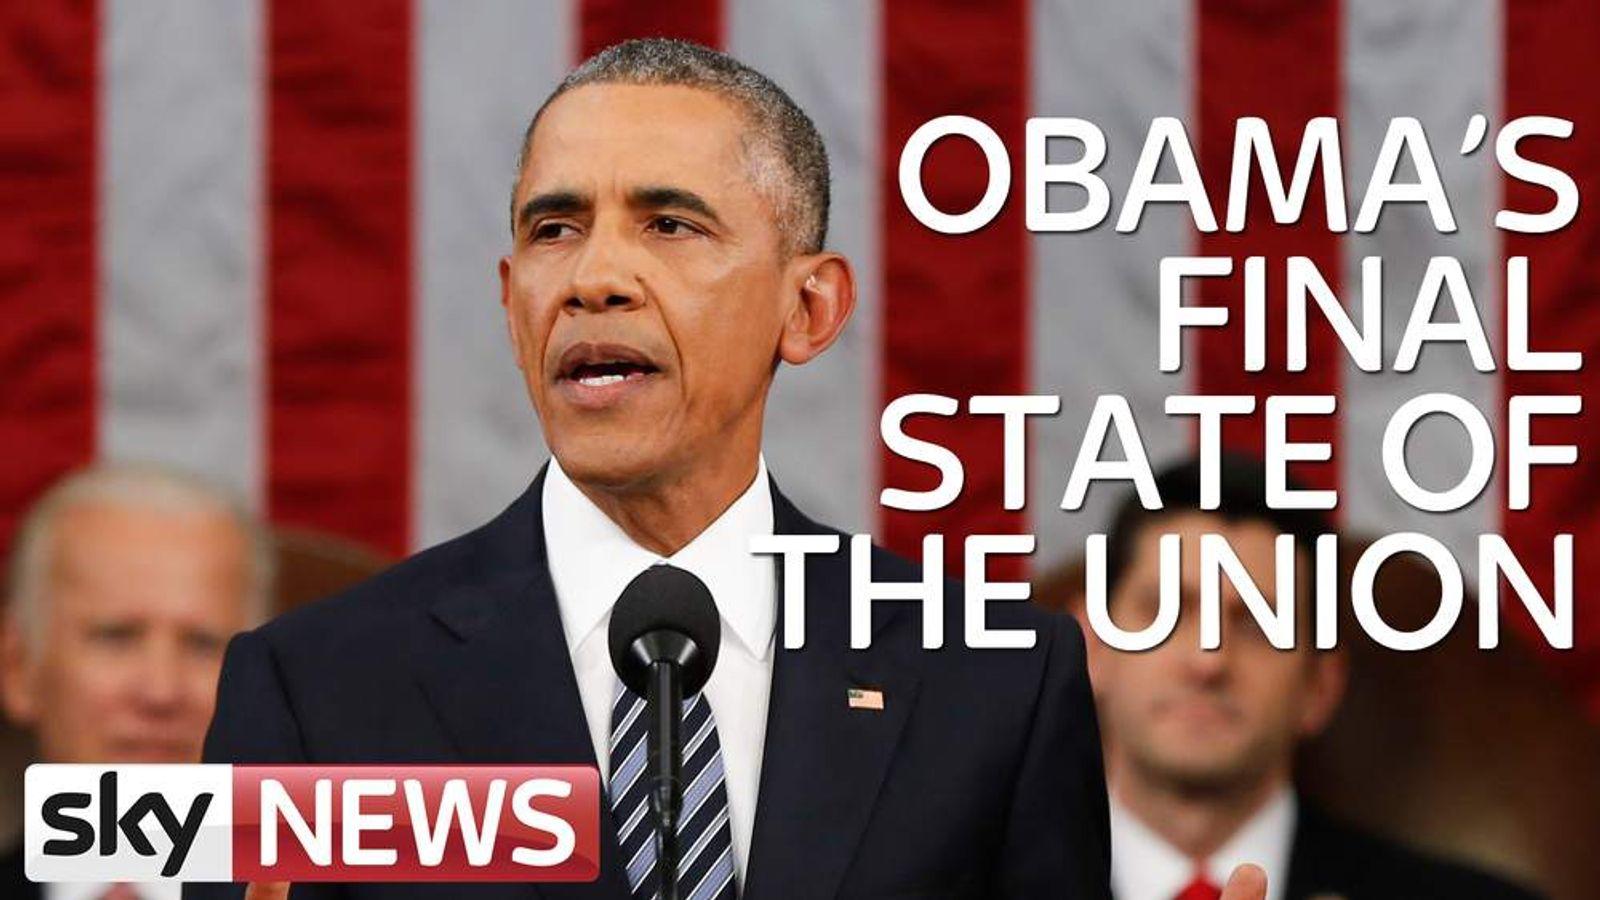 Obama state of the union slate